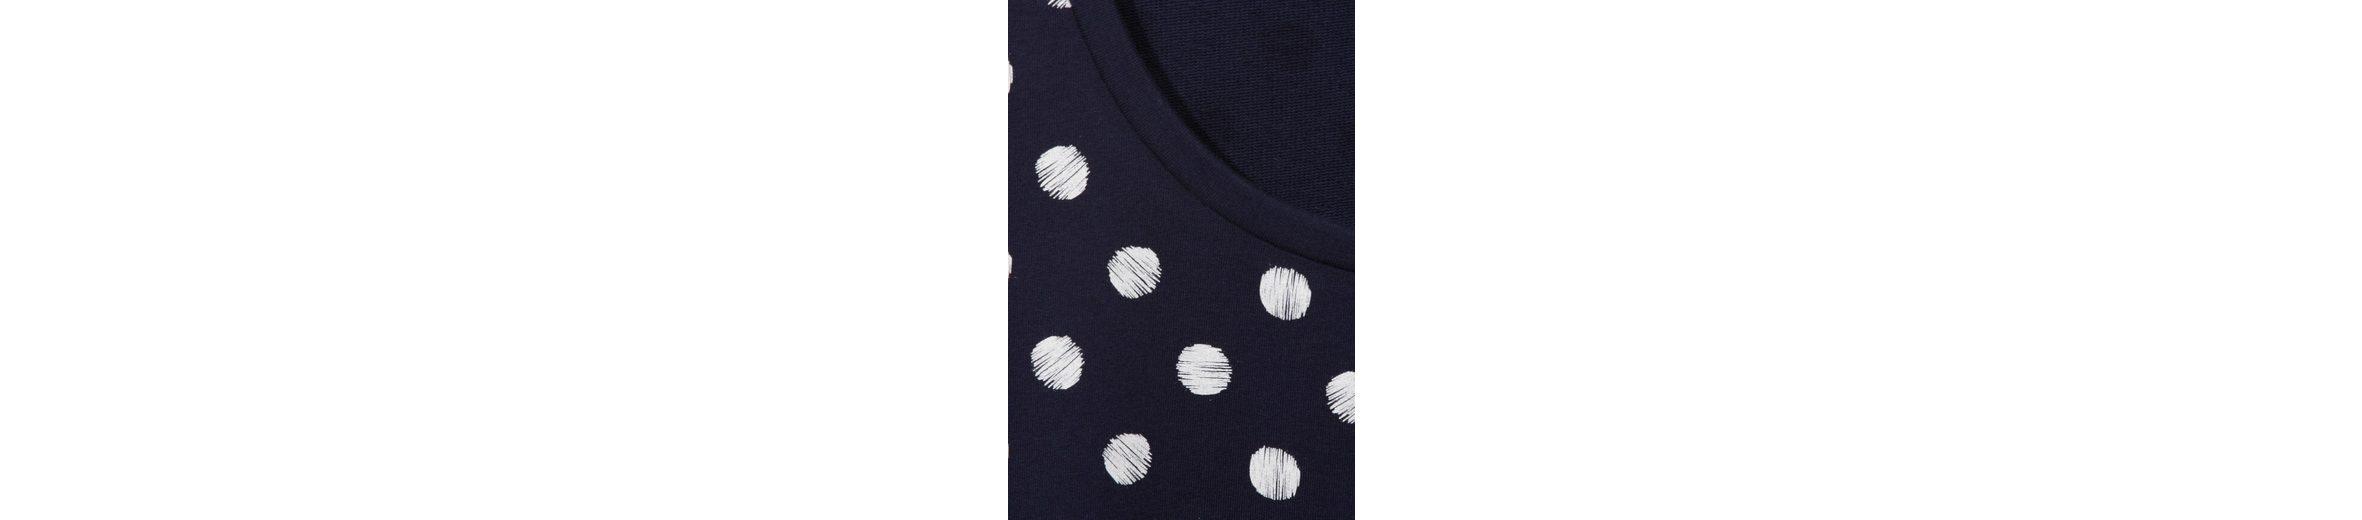 VIA APPIA DUE Légères Sweatshirt mit Dot-Muster Günstiger Preis Niedrig Versandgebühr 7FnK1Vmhq